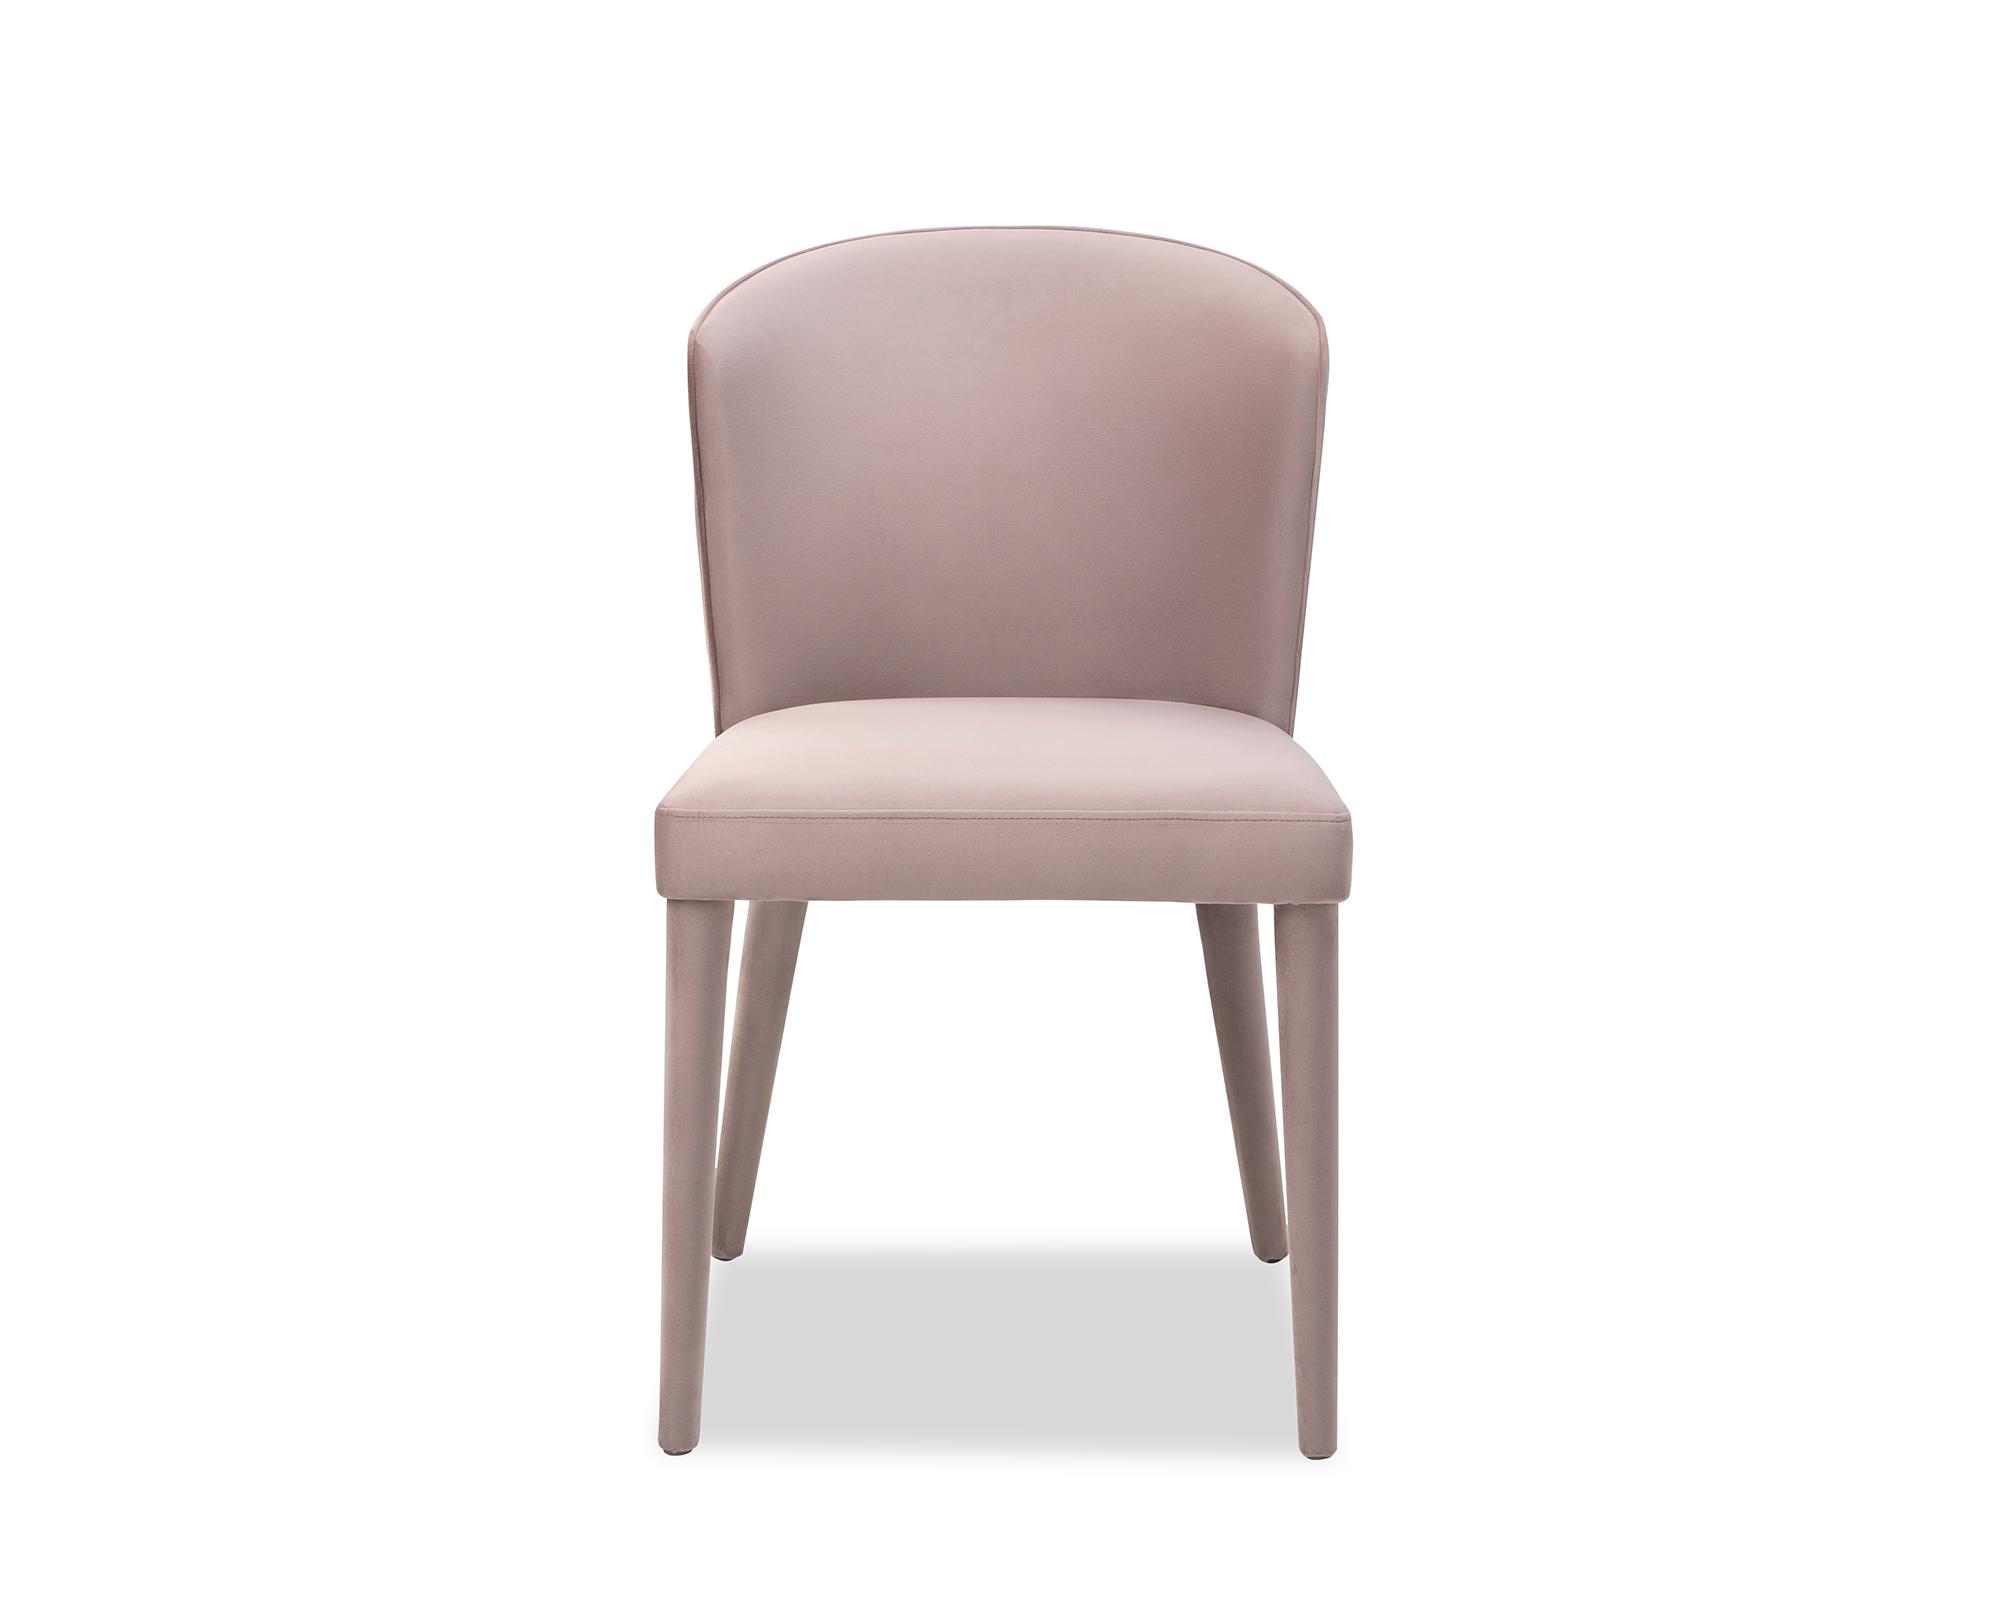 Liang & Eimil Kay Dining Chair Lilac Velvet BH-DCH-075 (2)